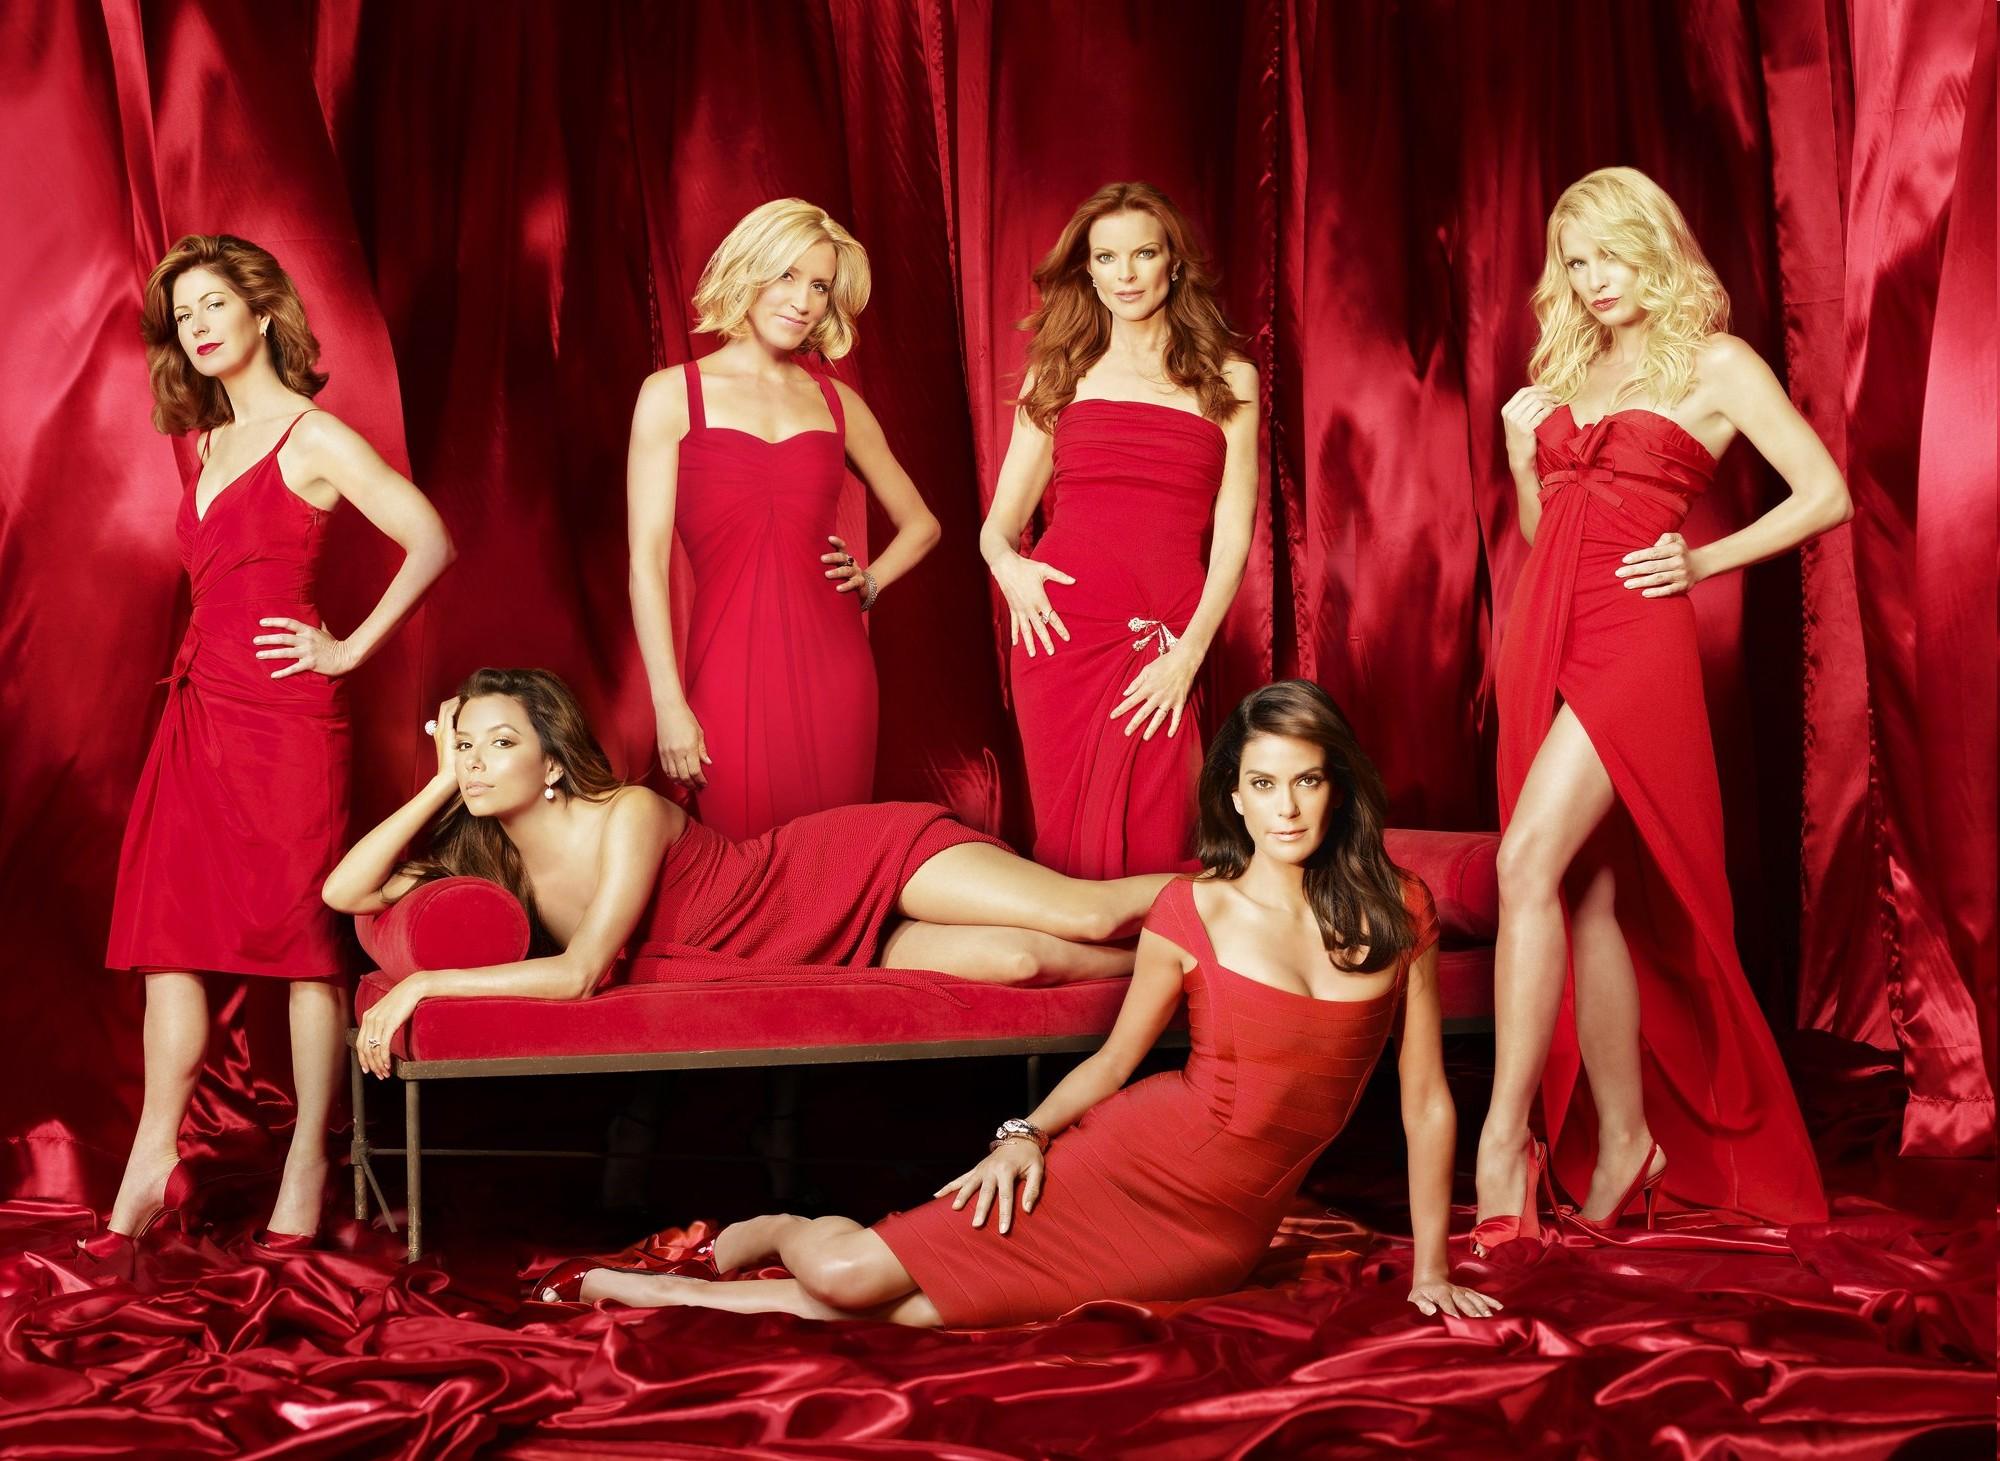 disney abc studio desperate housewives série saison 5